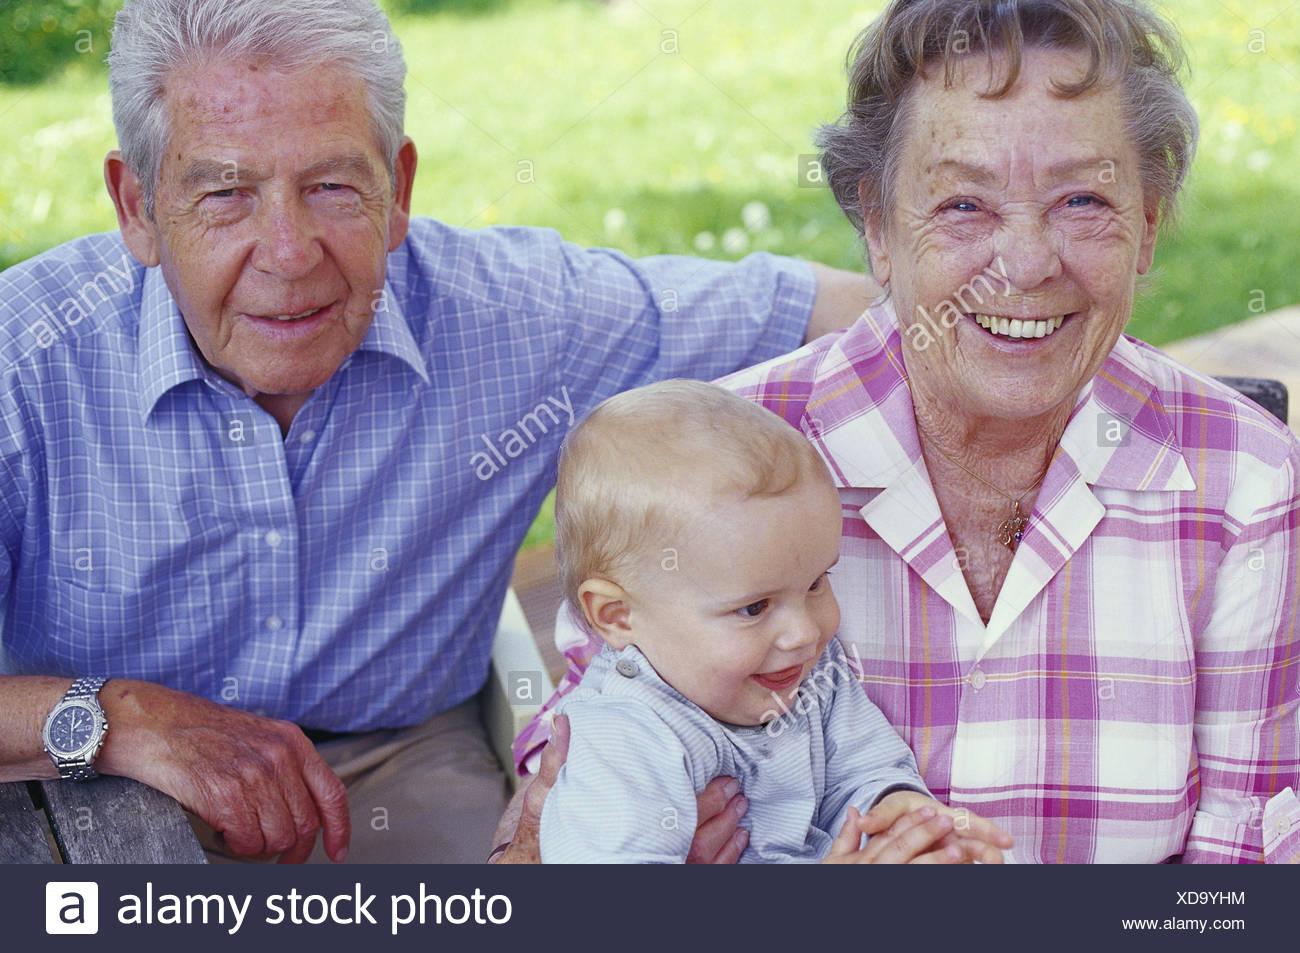 ... person, senior citizens, couple, grandparents, great-grandparents,  granny, grandpa, grandson, grandchild, great-grandchild, old grandchild,  infant, boy, ...